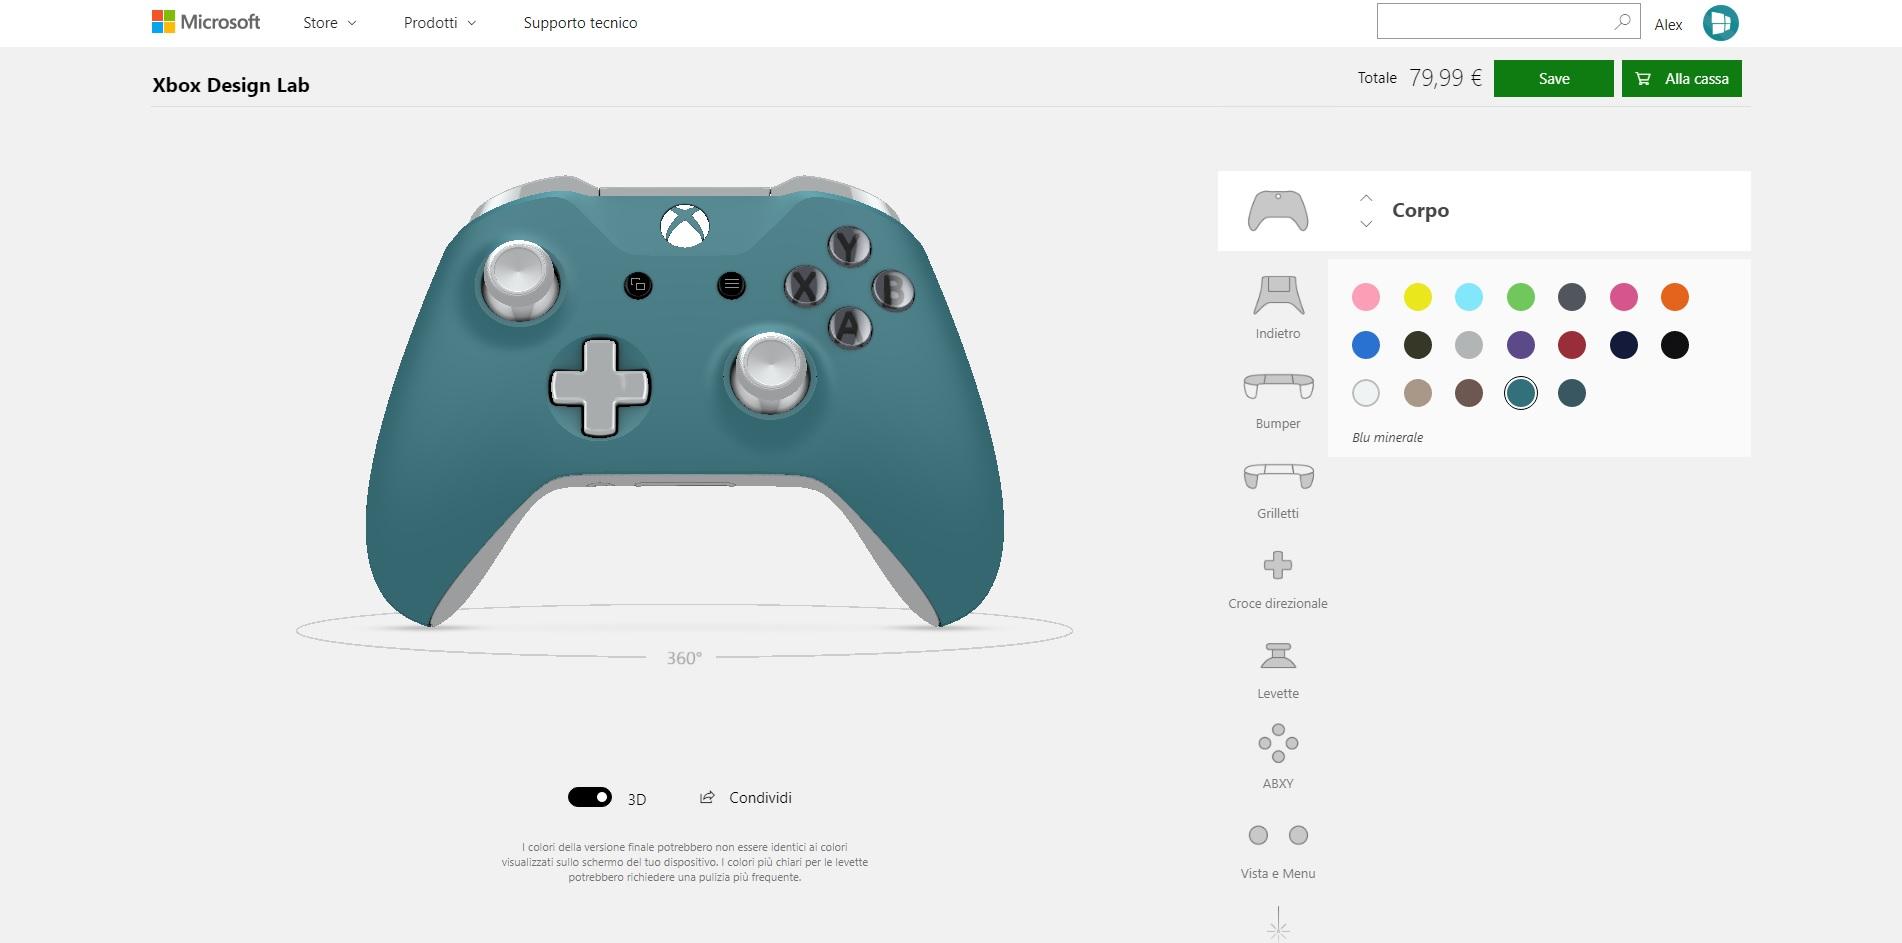 Xbox Controller Wireless Design Lab